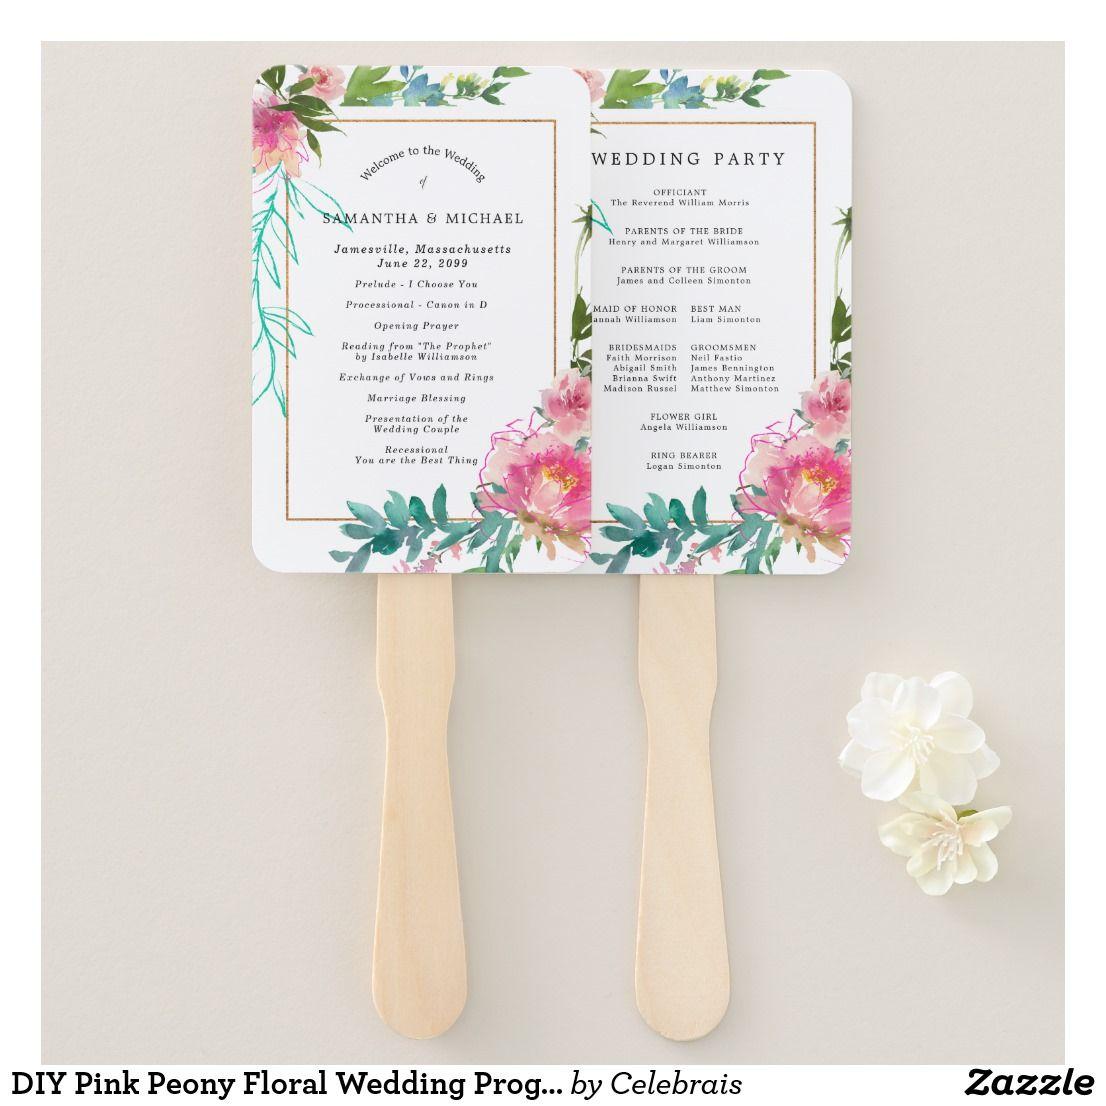 Diy pink peony floral wedding program hand fan hand fans